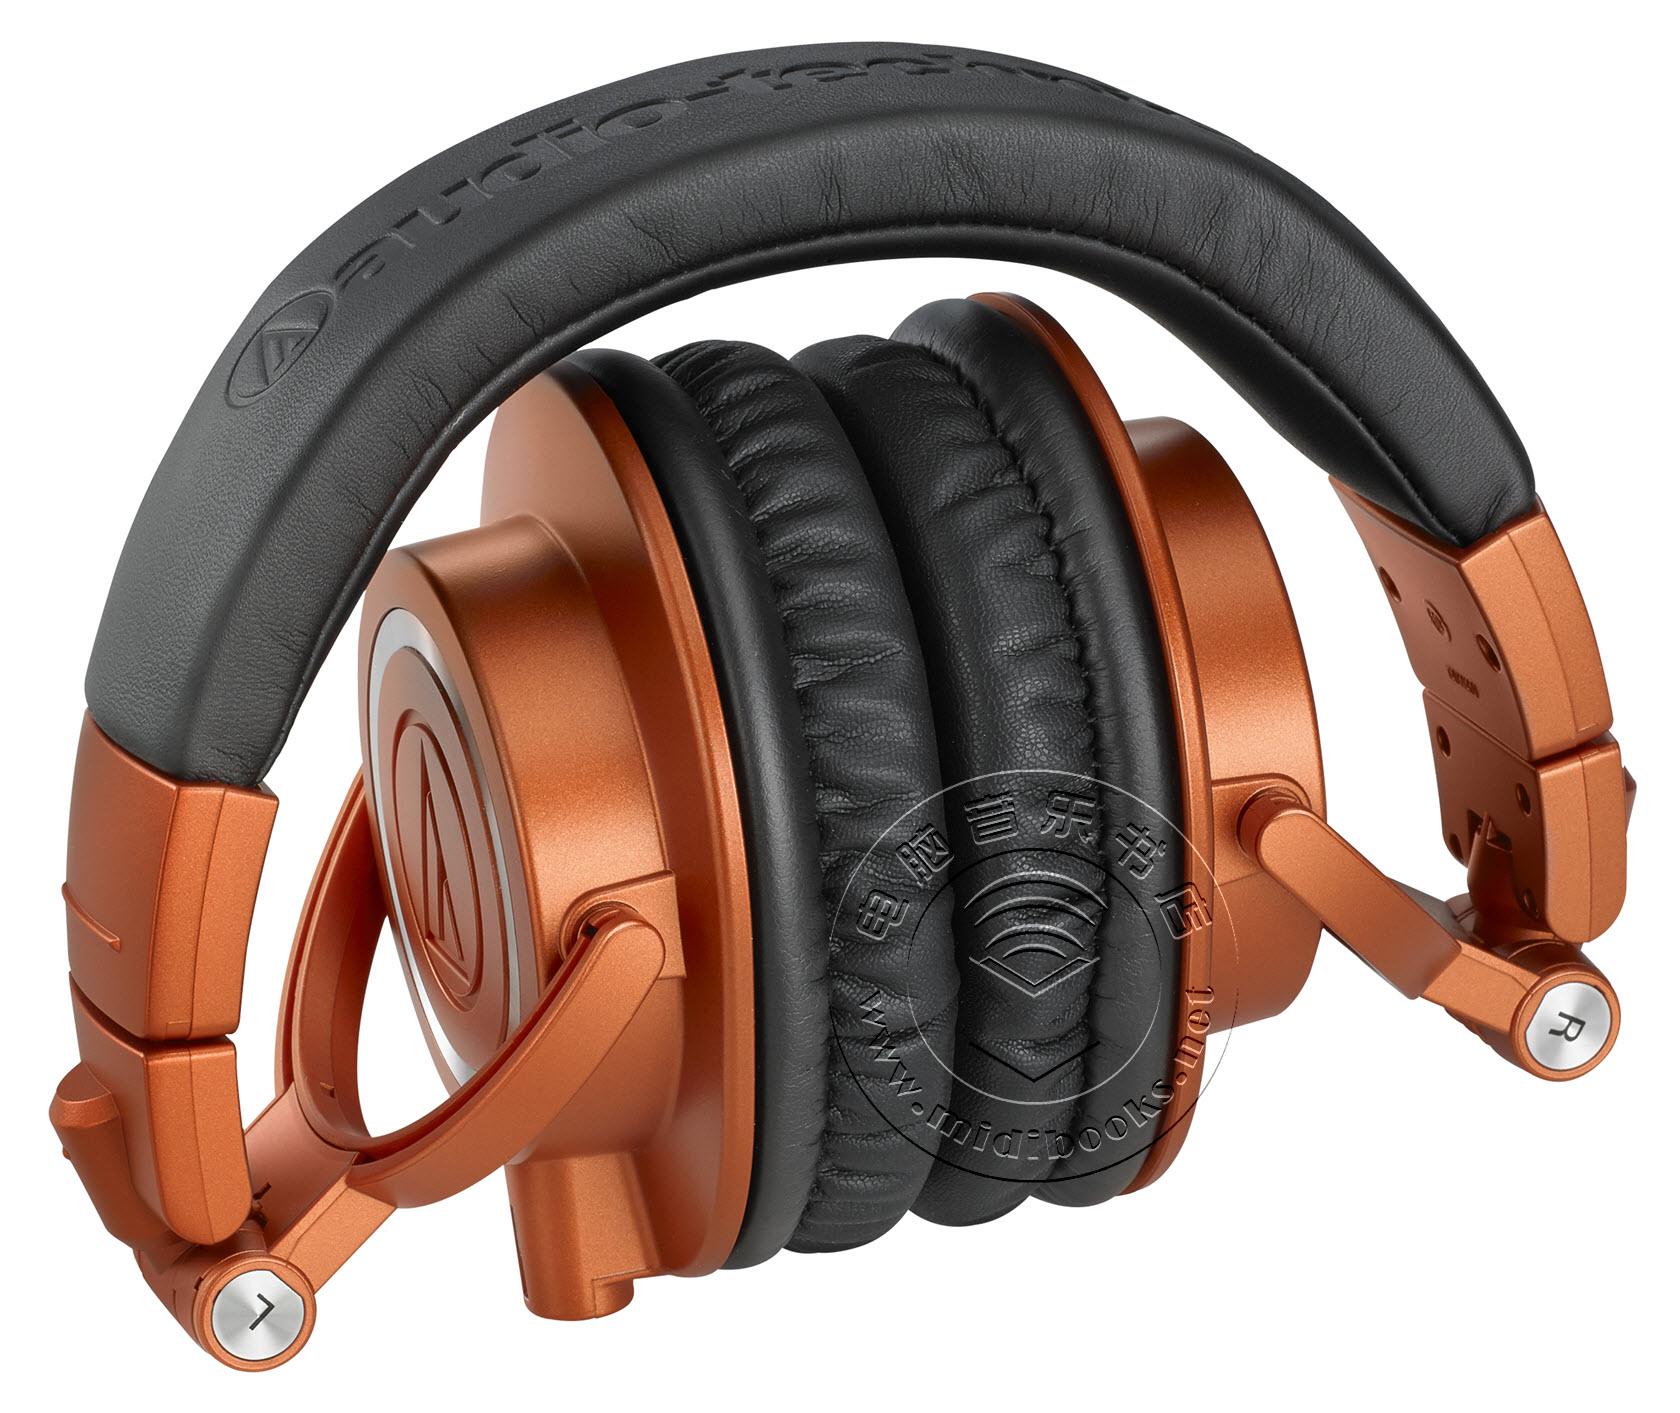 Audio-Technica(铁三角)发布橙色限量版ATH-M50x监听耳机